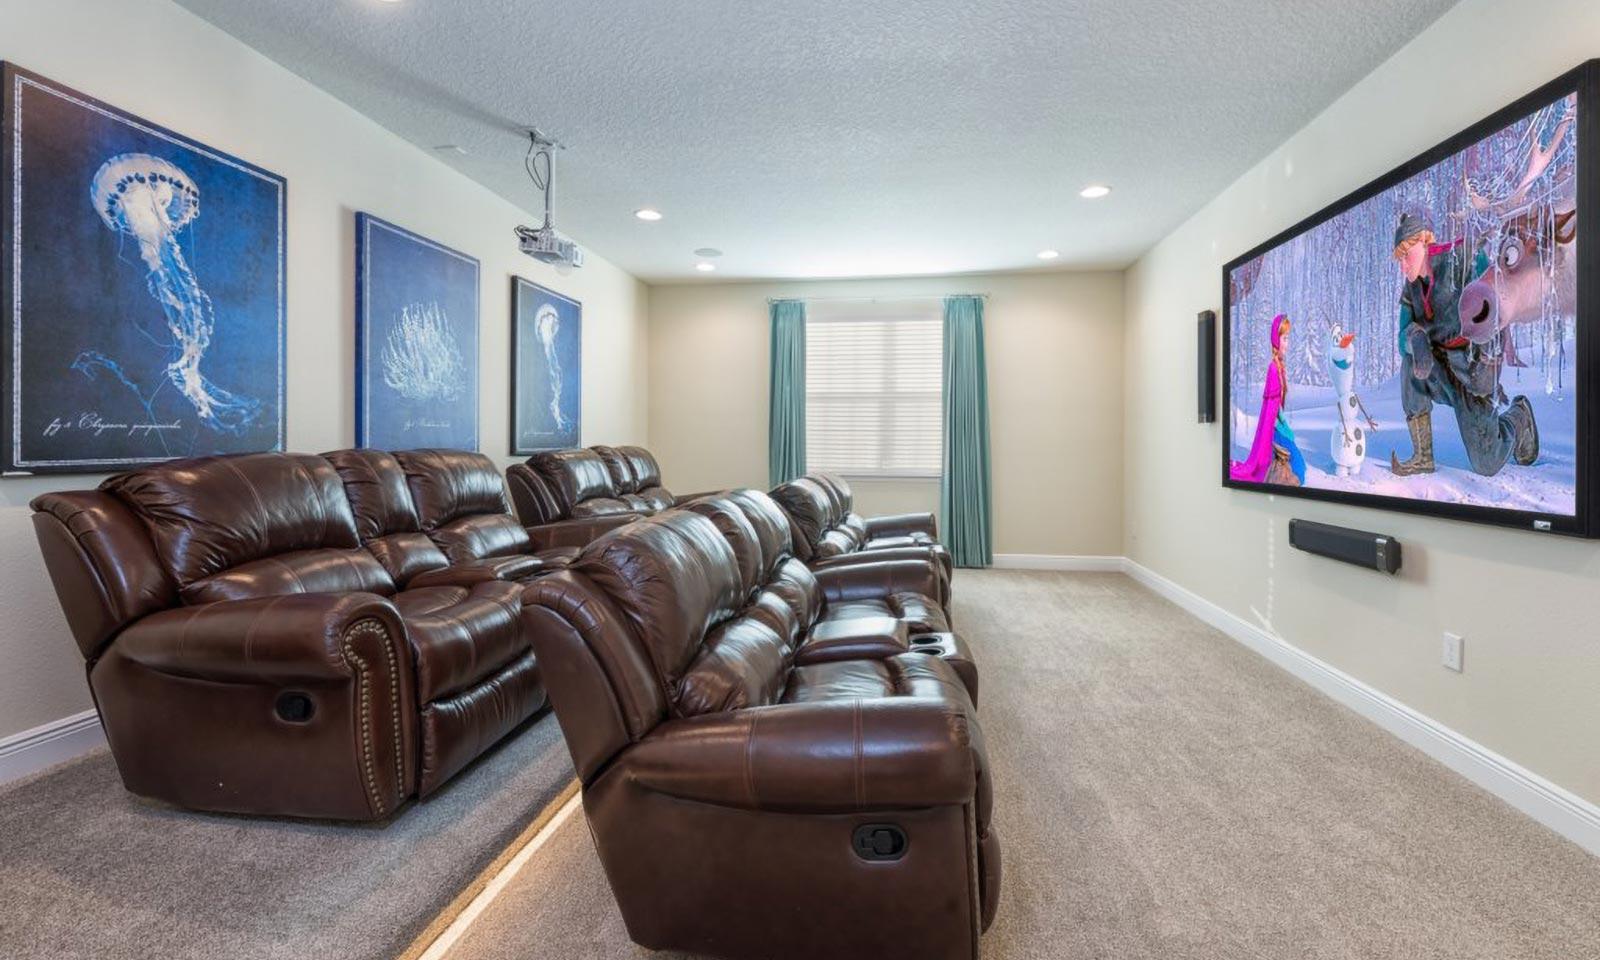 [amenities:Theater:Room:1] Theater Room